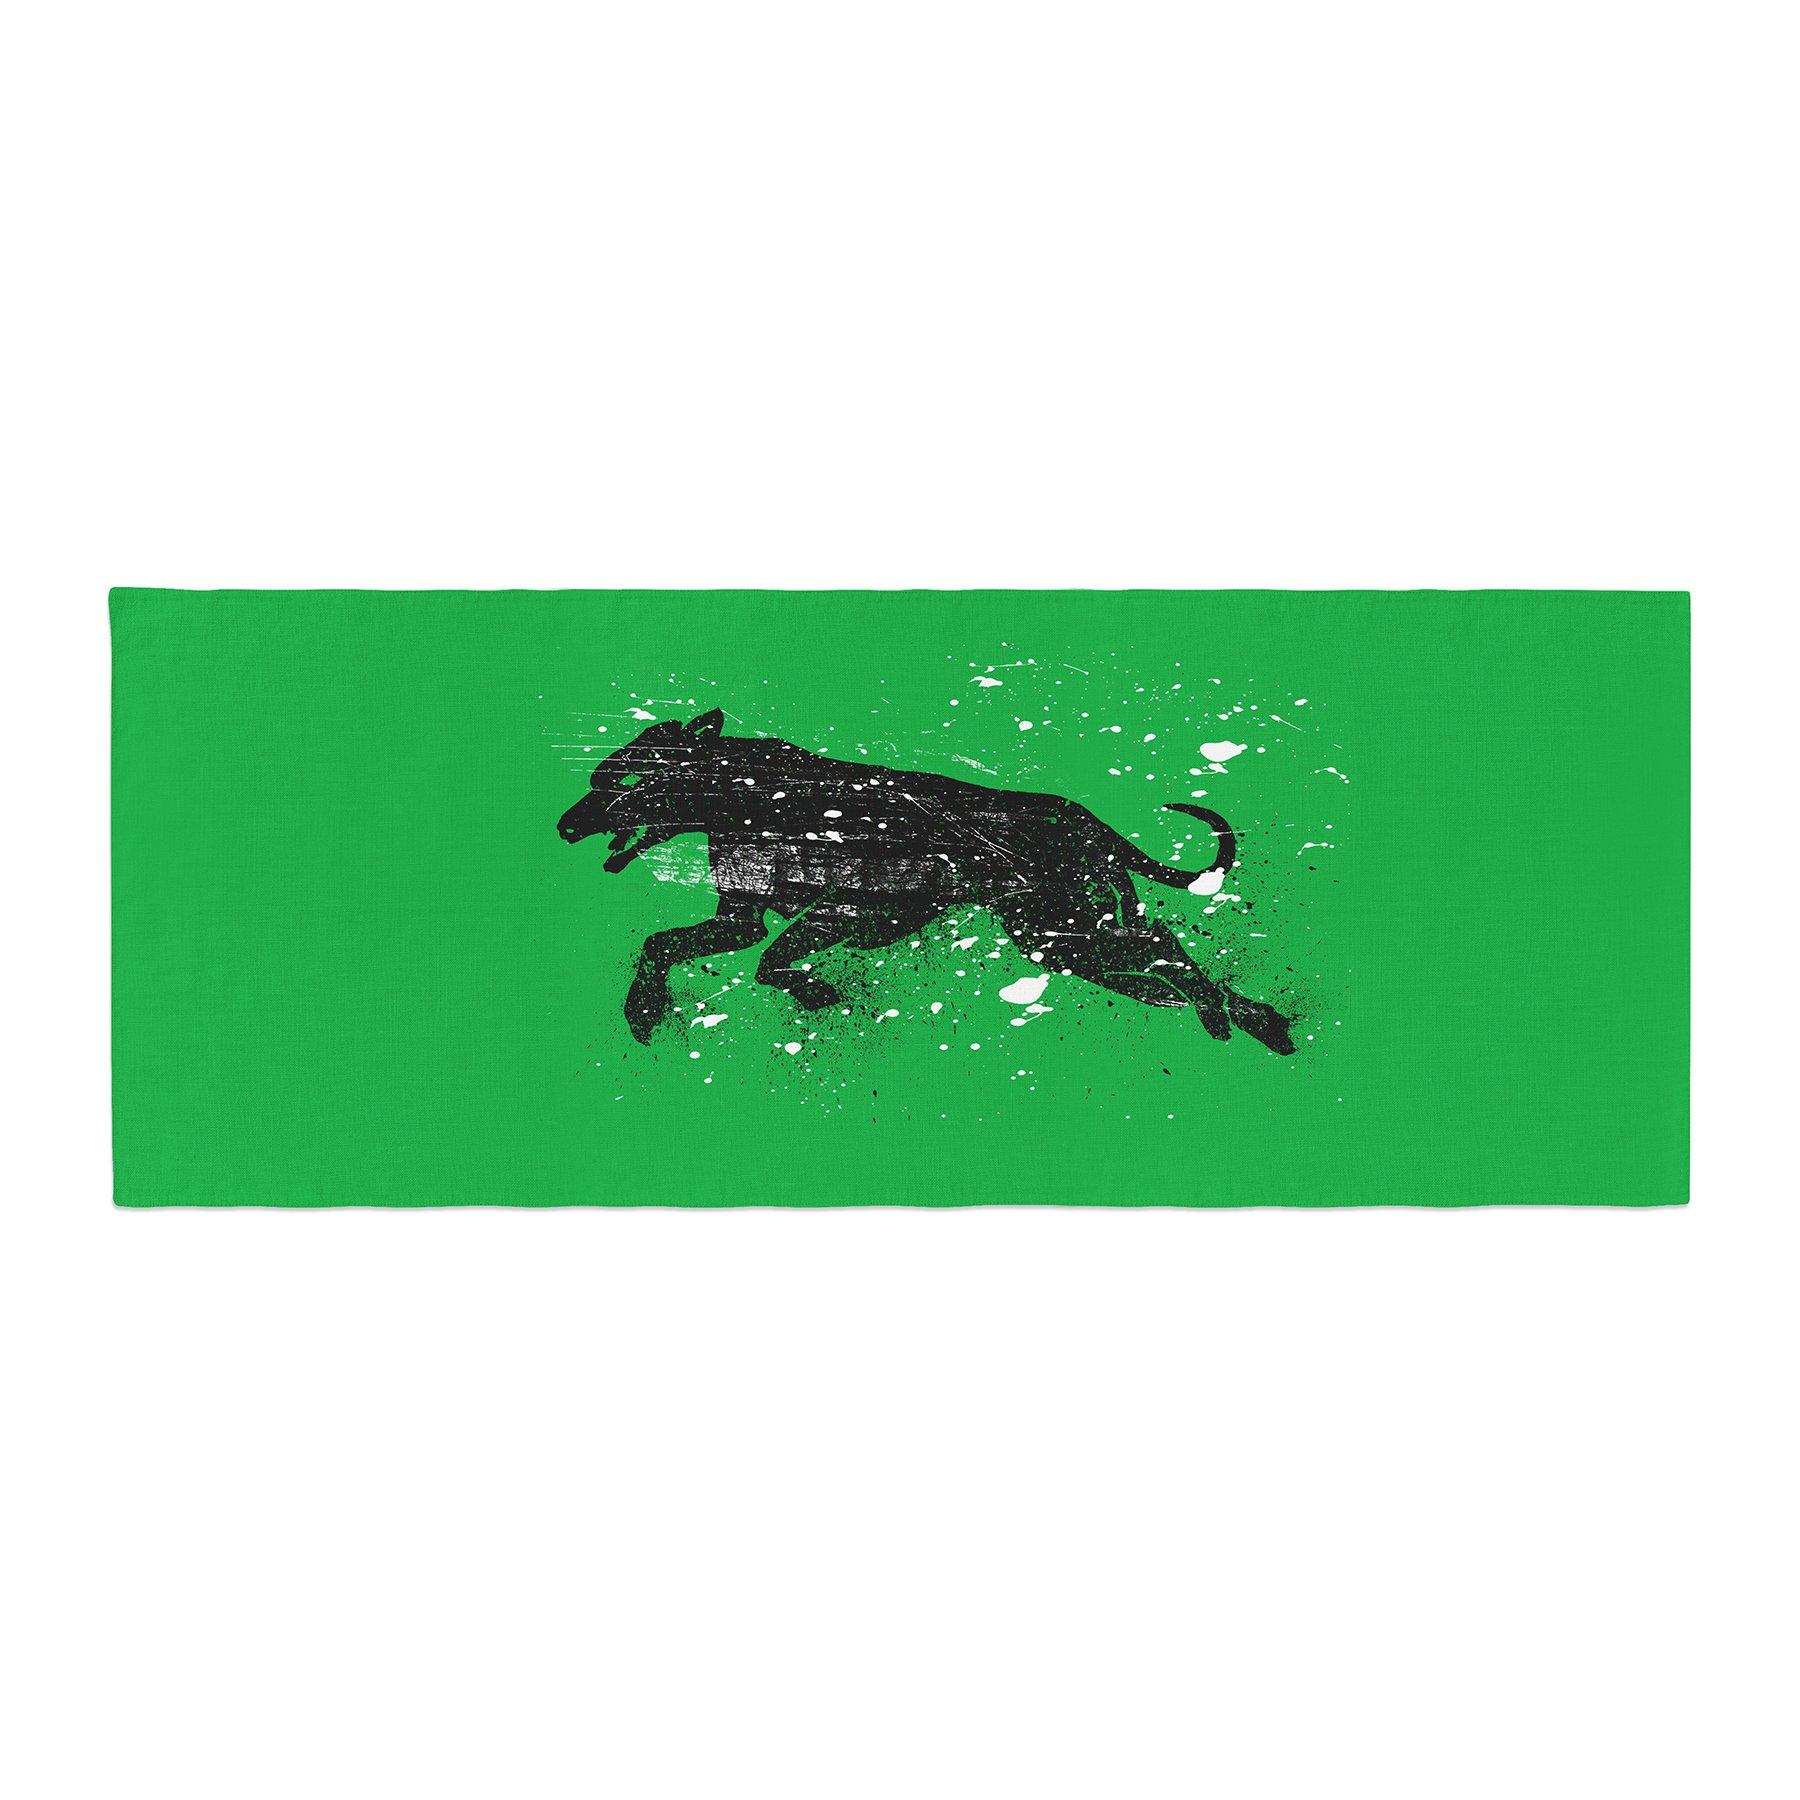 Kess InHouse BarmalisiRTB Black Dog Green Animal Bed Runner, 34'' x 86''